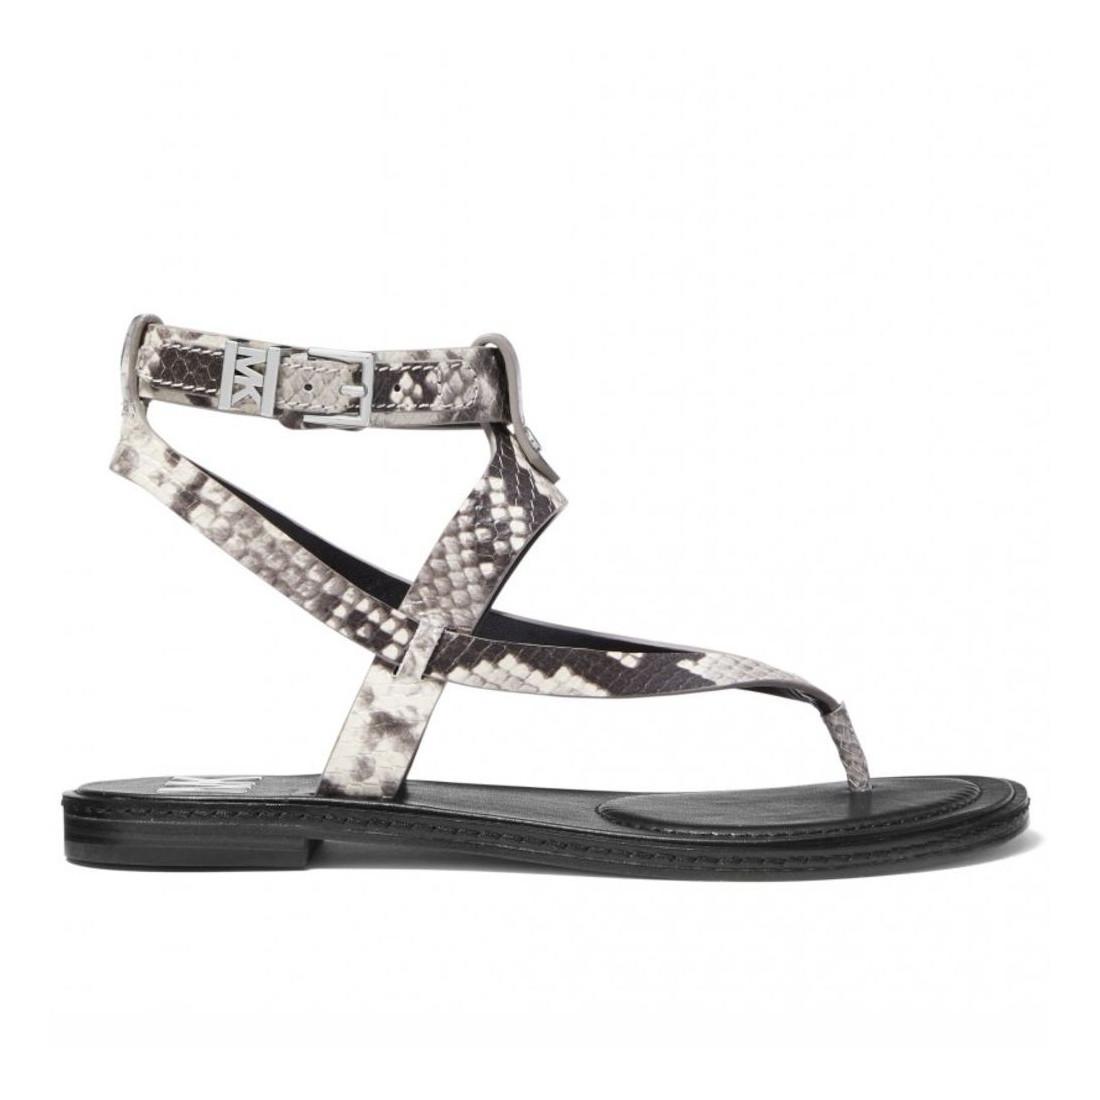 sandals woman michael kors 40s0pefa1e270 7037